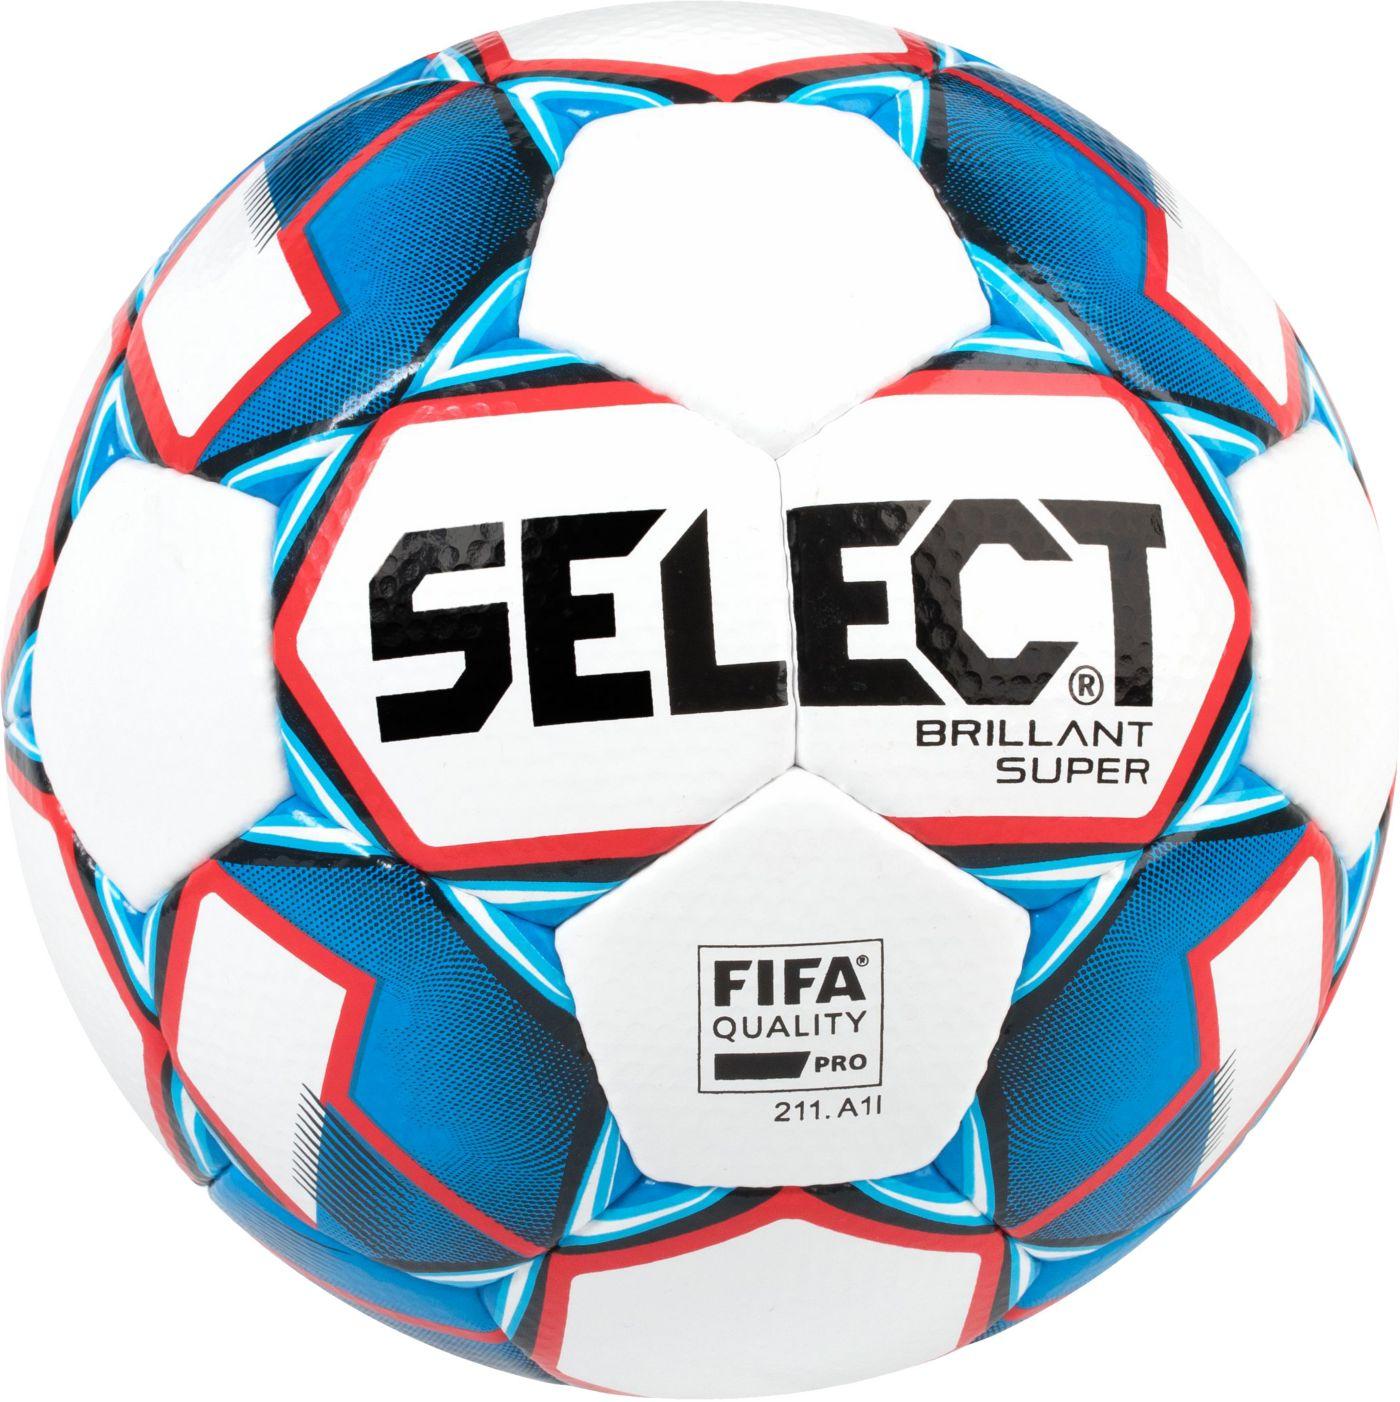 Select Brilliant Super FIFA 2018 Official Match Soccer Ball